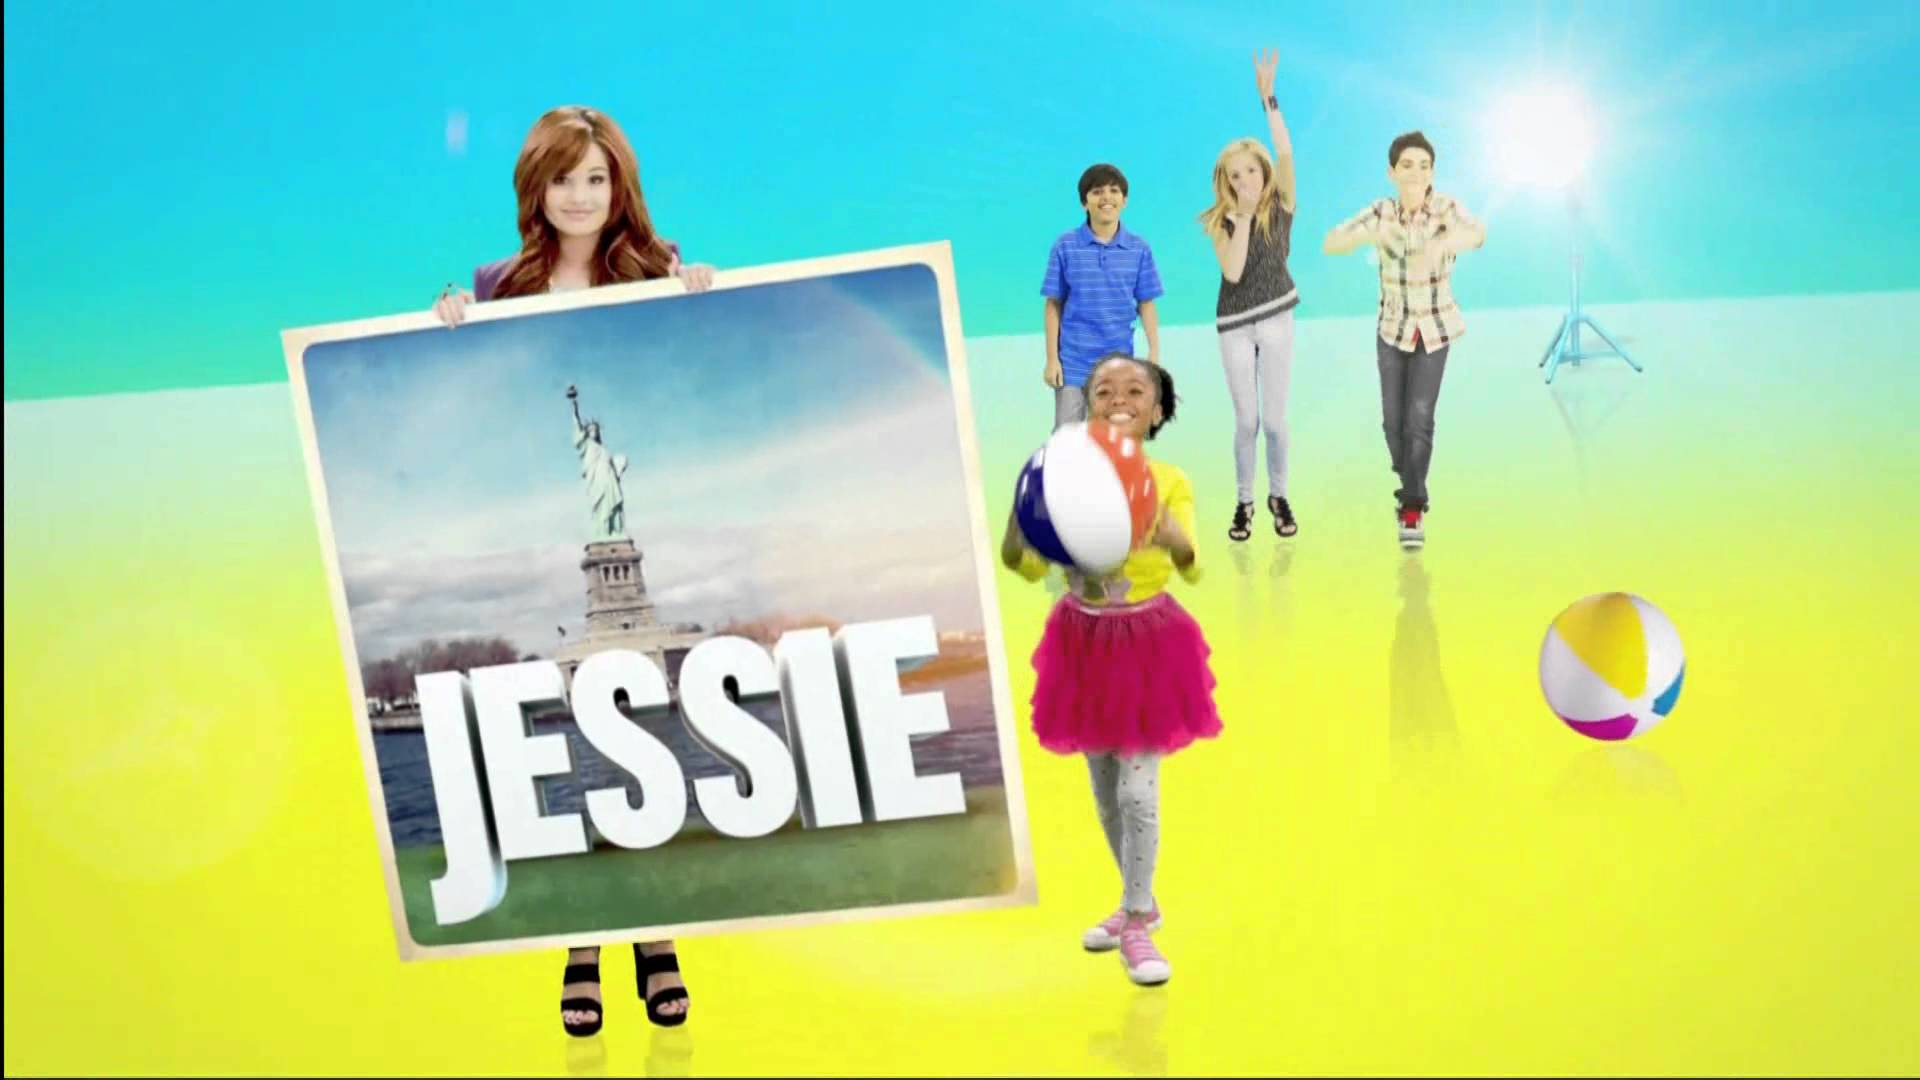 Disney Jessie Wallpaper Disney Channel uk hd Jessie 1920x1080